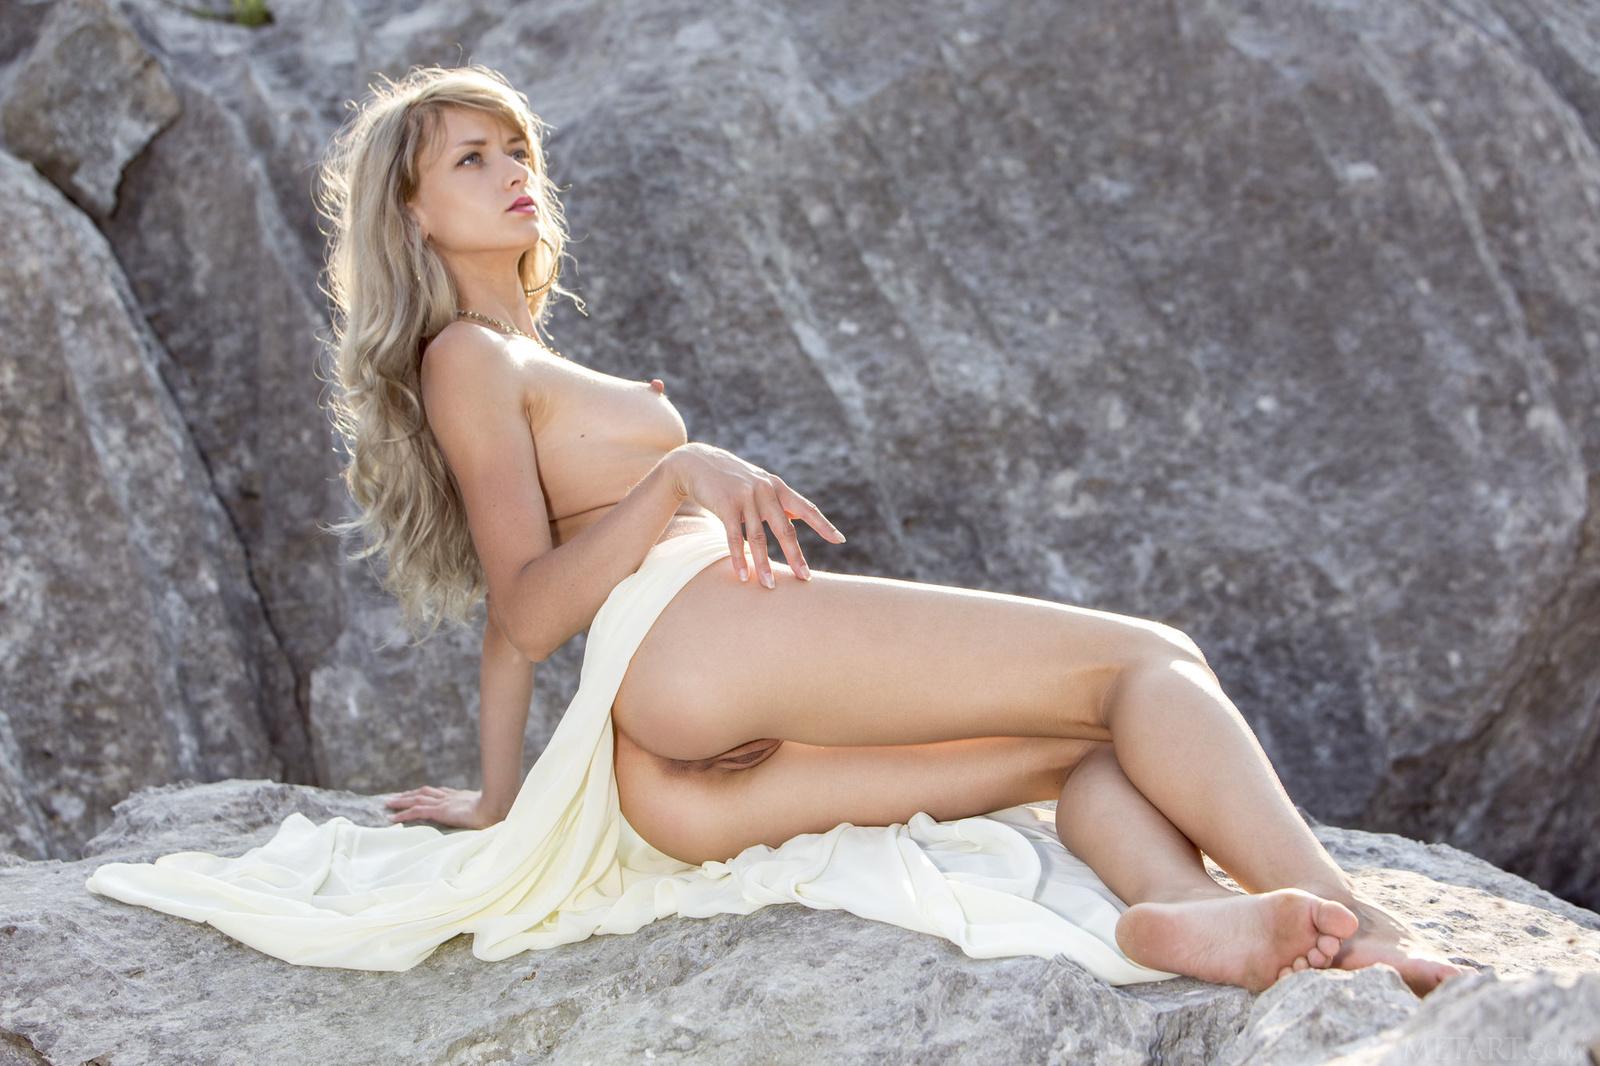 Zdjęcie porno - 05 - Suczka na skale